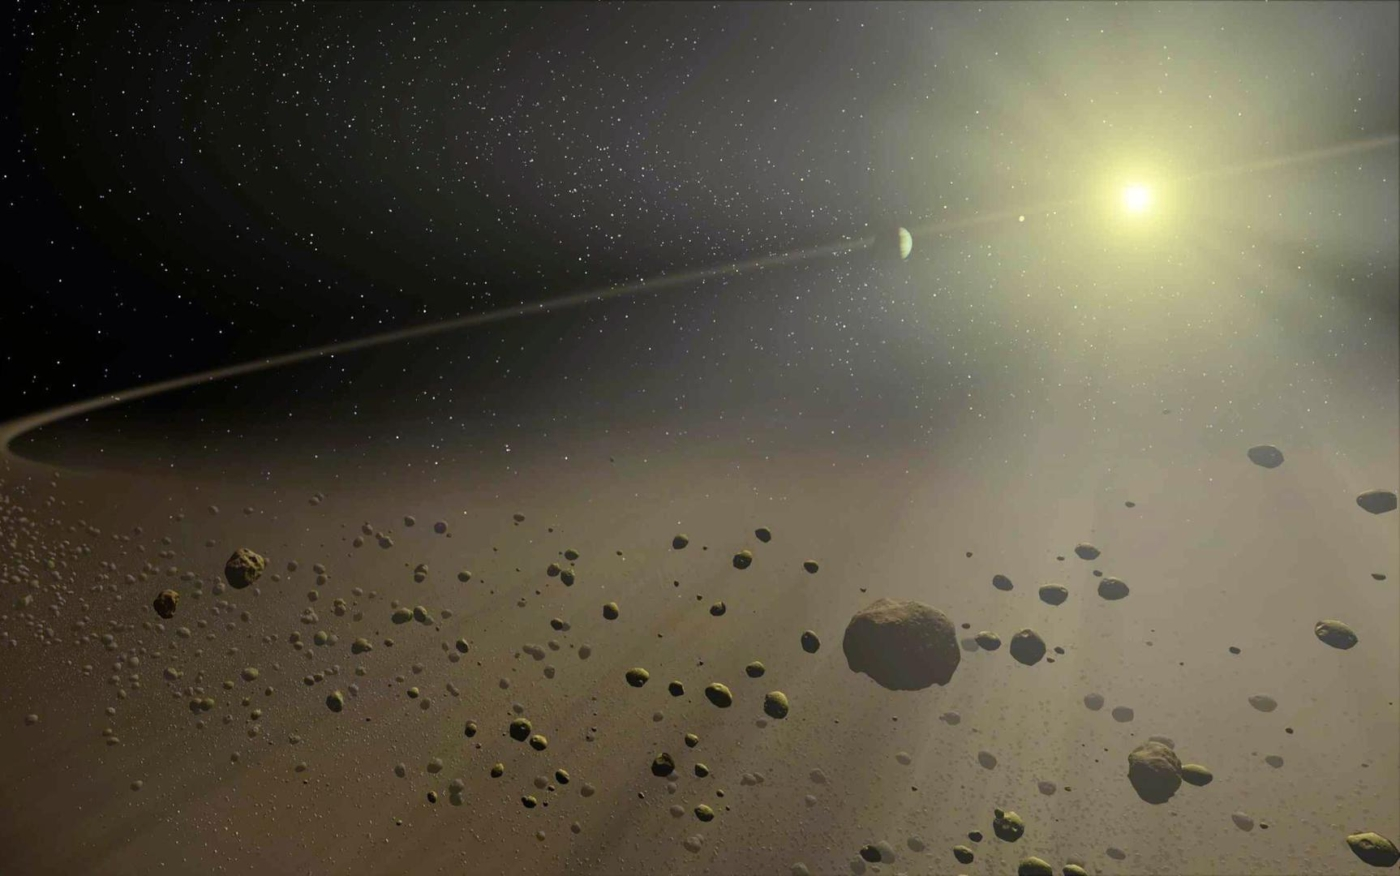 Солнце «украло» кометы у других звезд